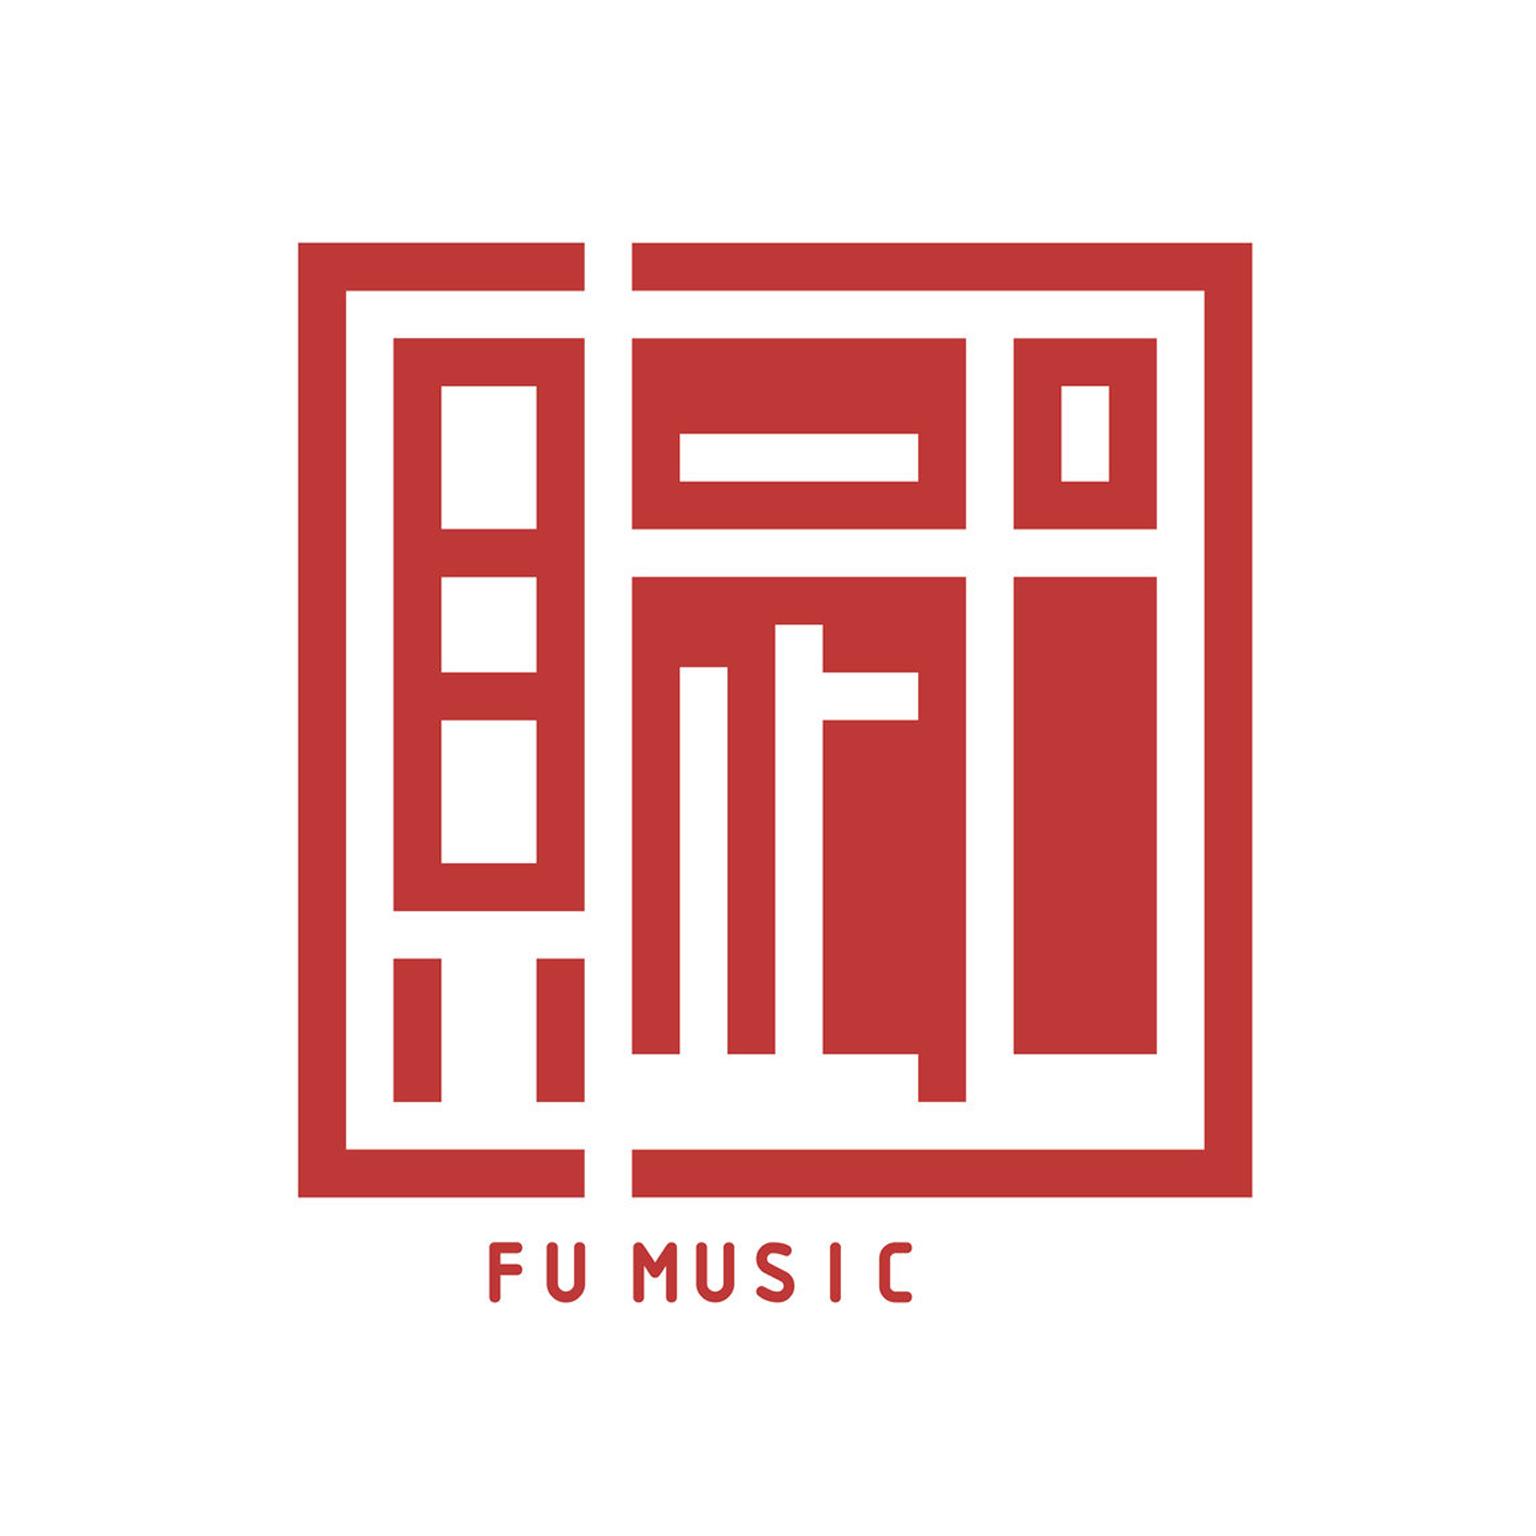 Fu Music.jpg